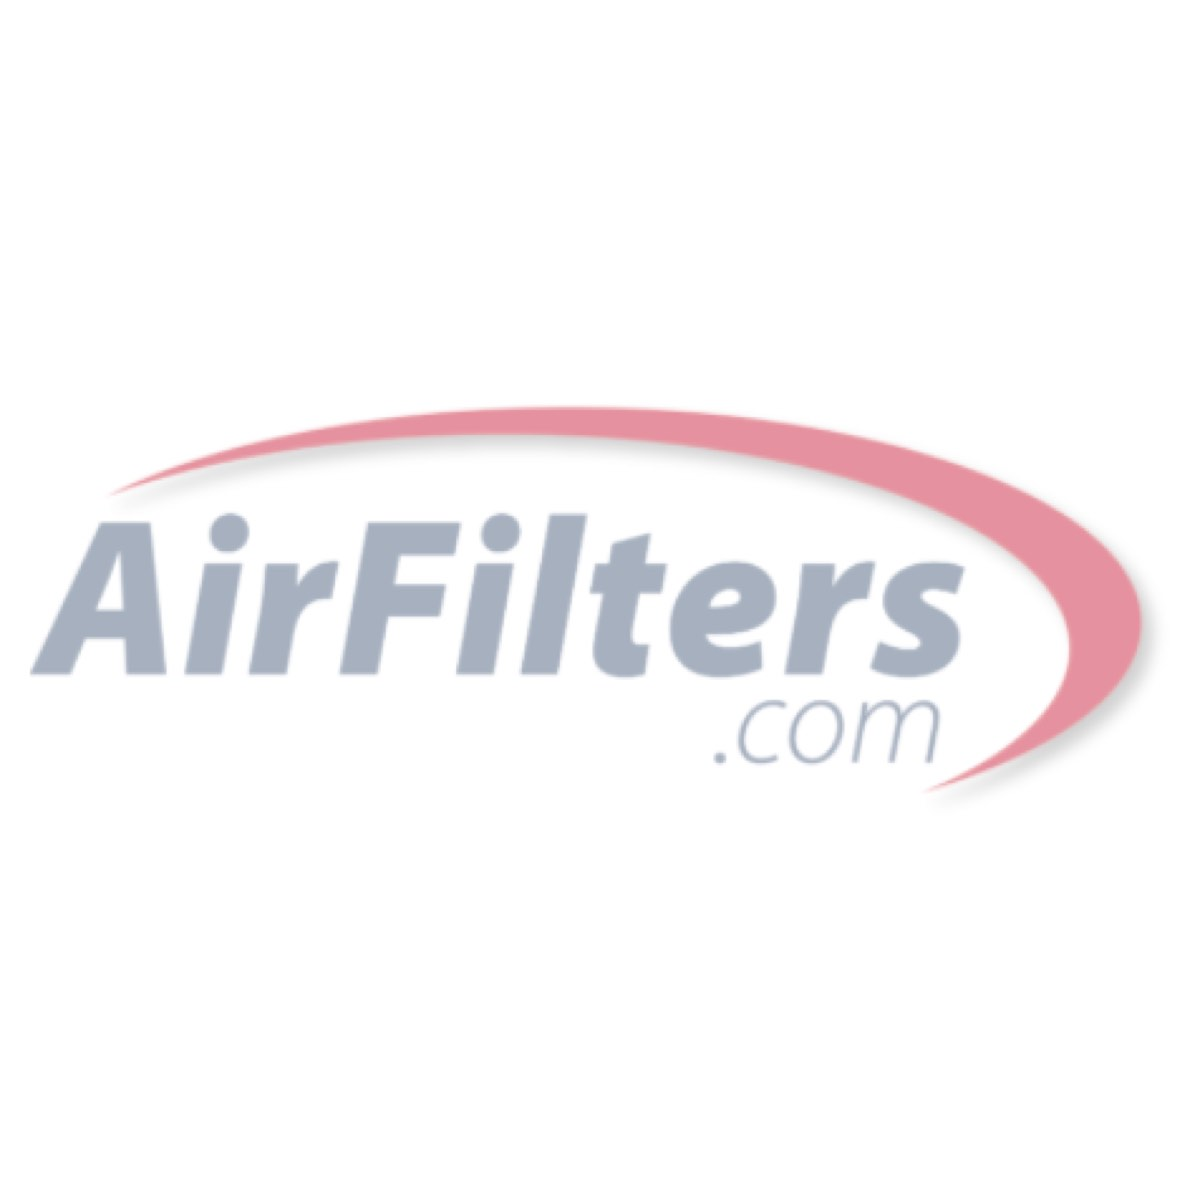 20x25x4.5 (19.75 x 24.38 x 4.38) Carrier® EZ Flex Filters by Accumulair®